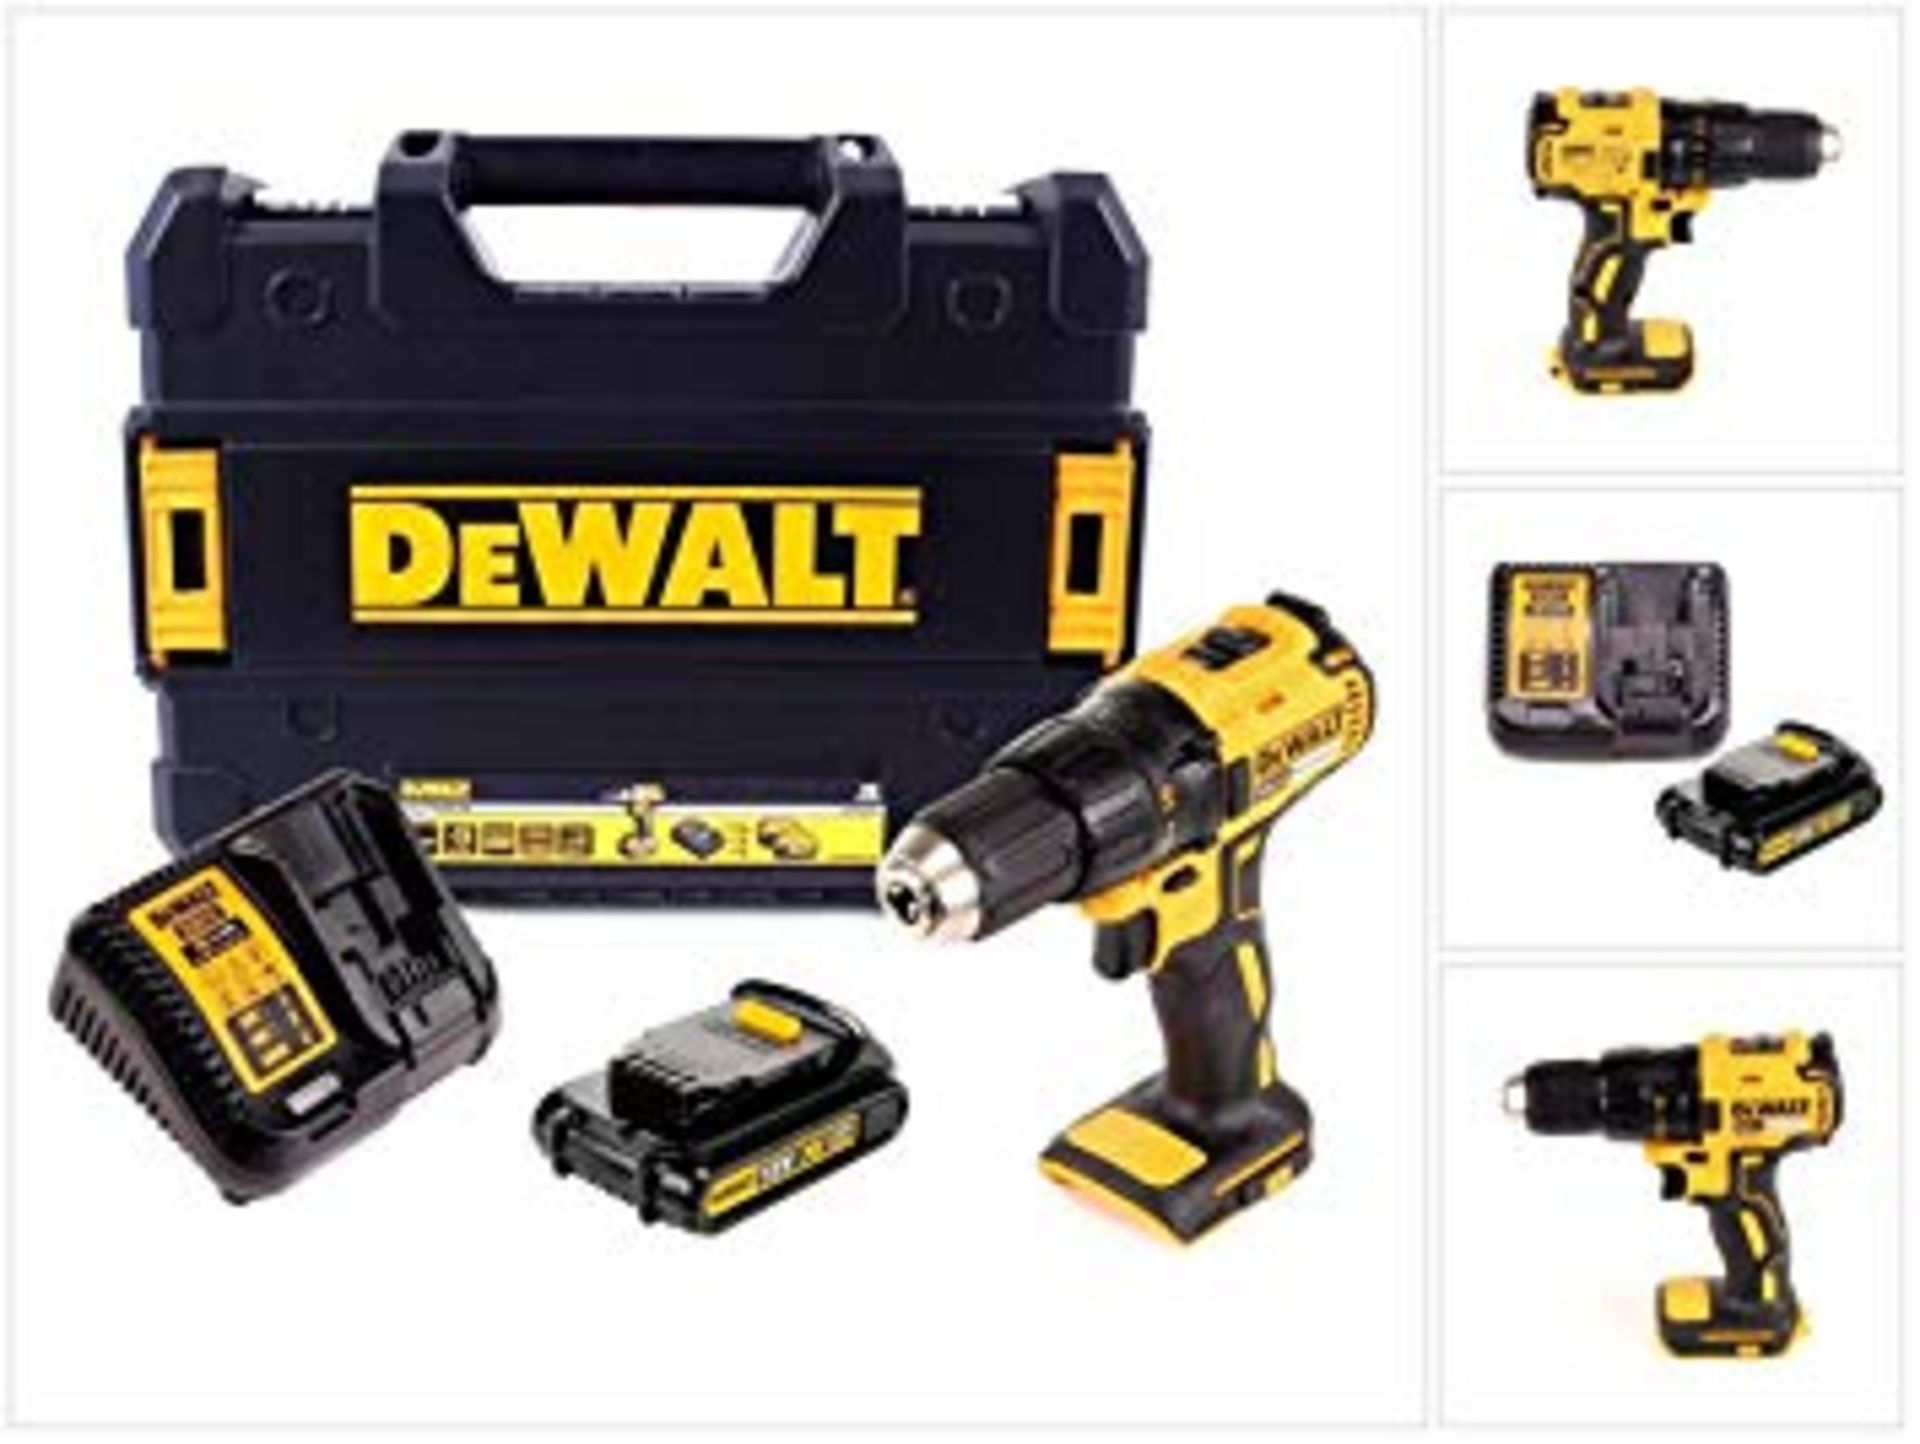 Lot 17007 - V Brand New DeWalt 18v Brushless Drill Driver With Battery And Charger In DeWalt Plastic Case